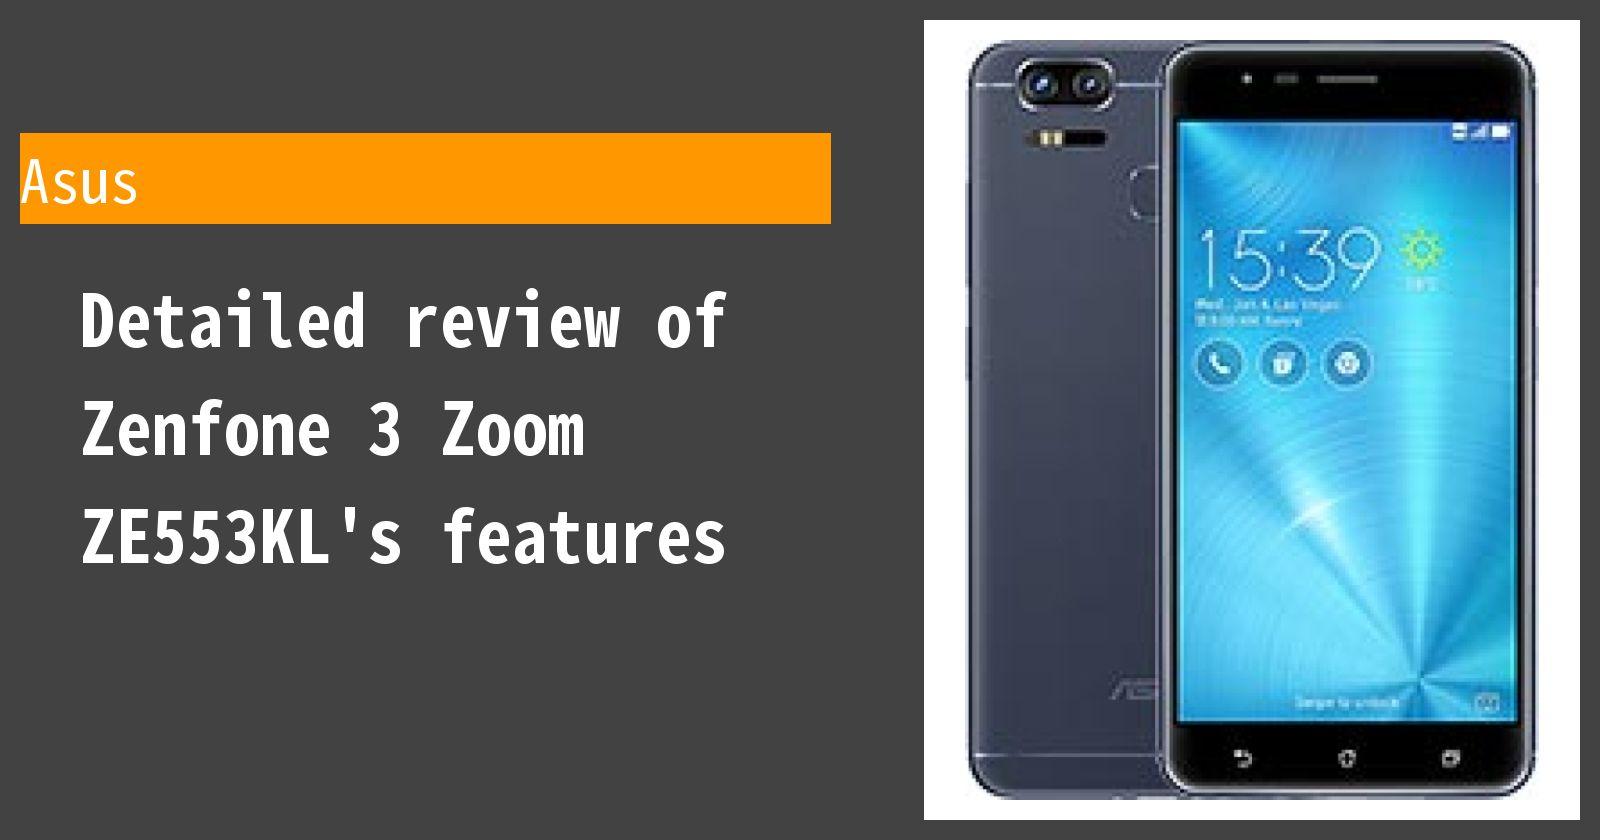 Detailed review of Zenfone 3 Zoom ZE553KL's features